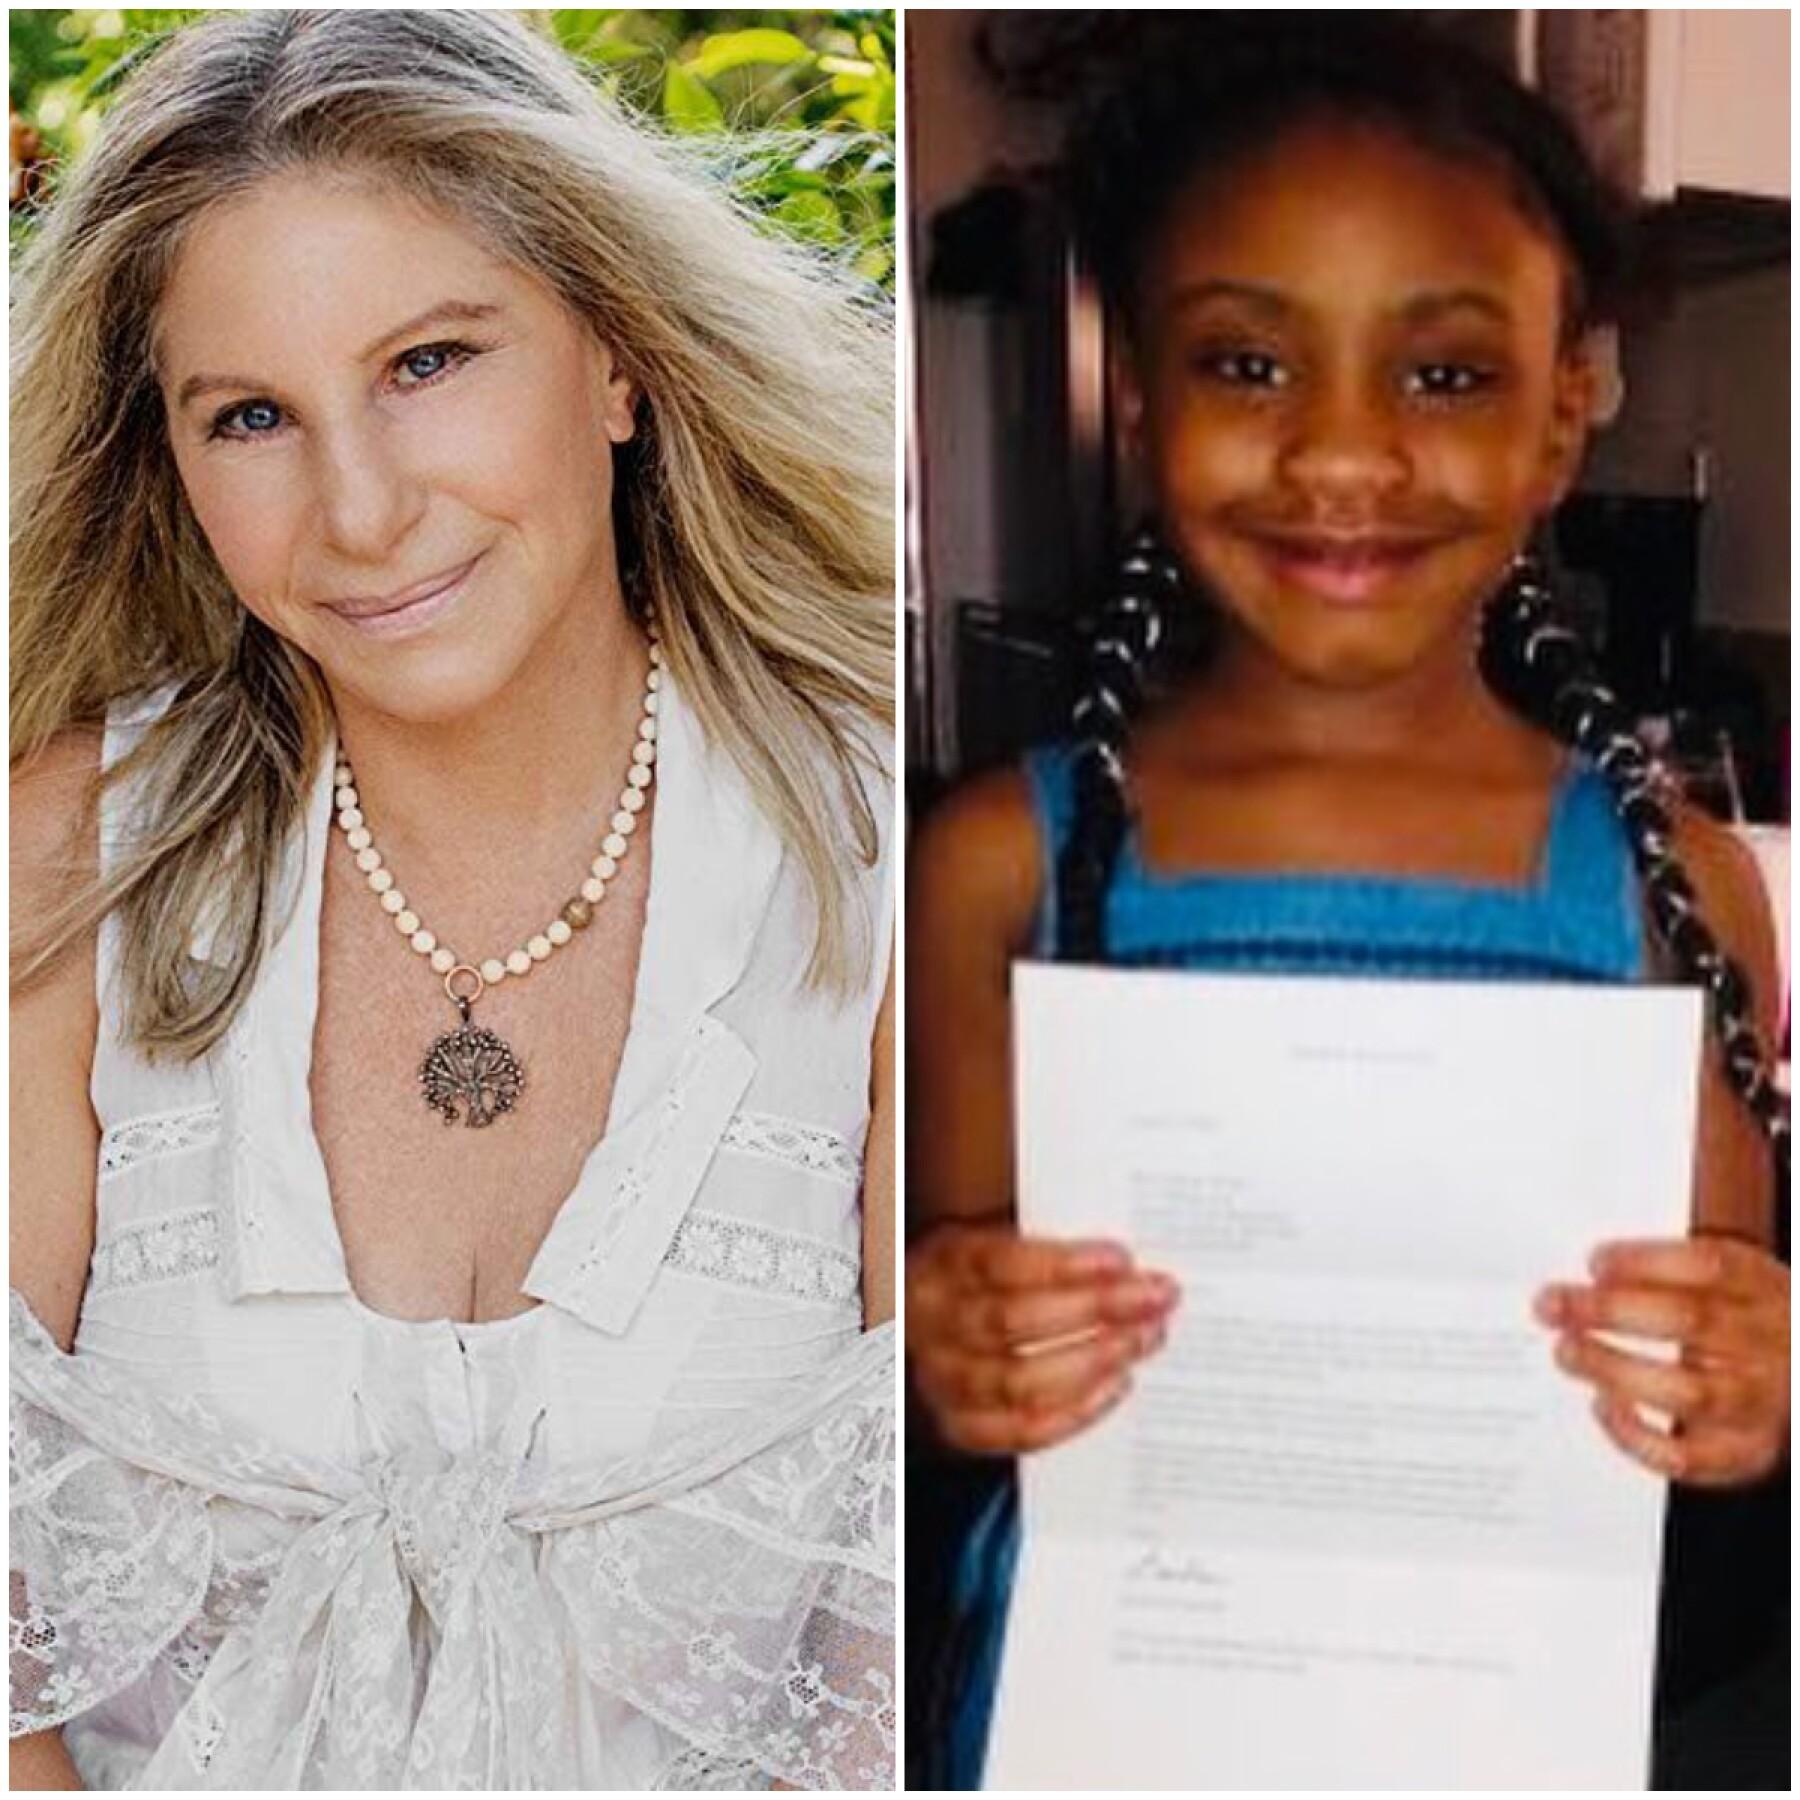 Barbra Streisand y Gianna Floyd.